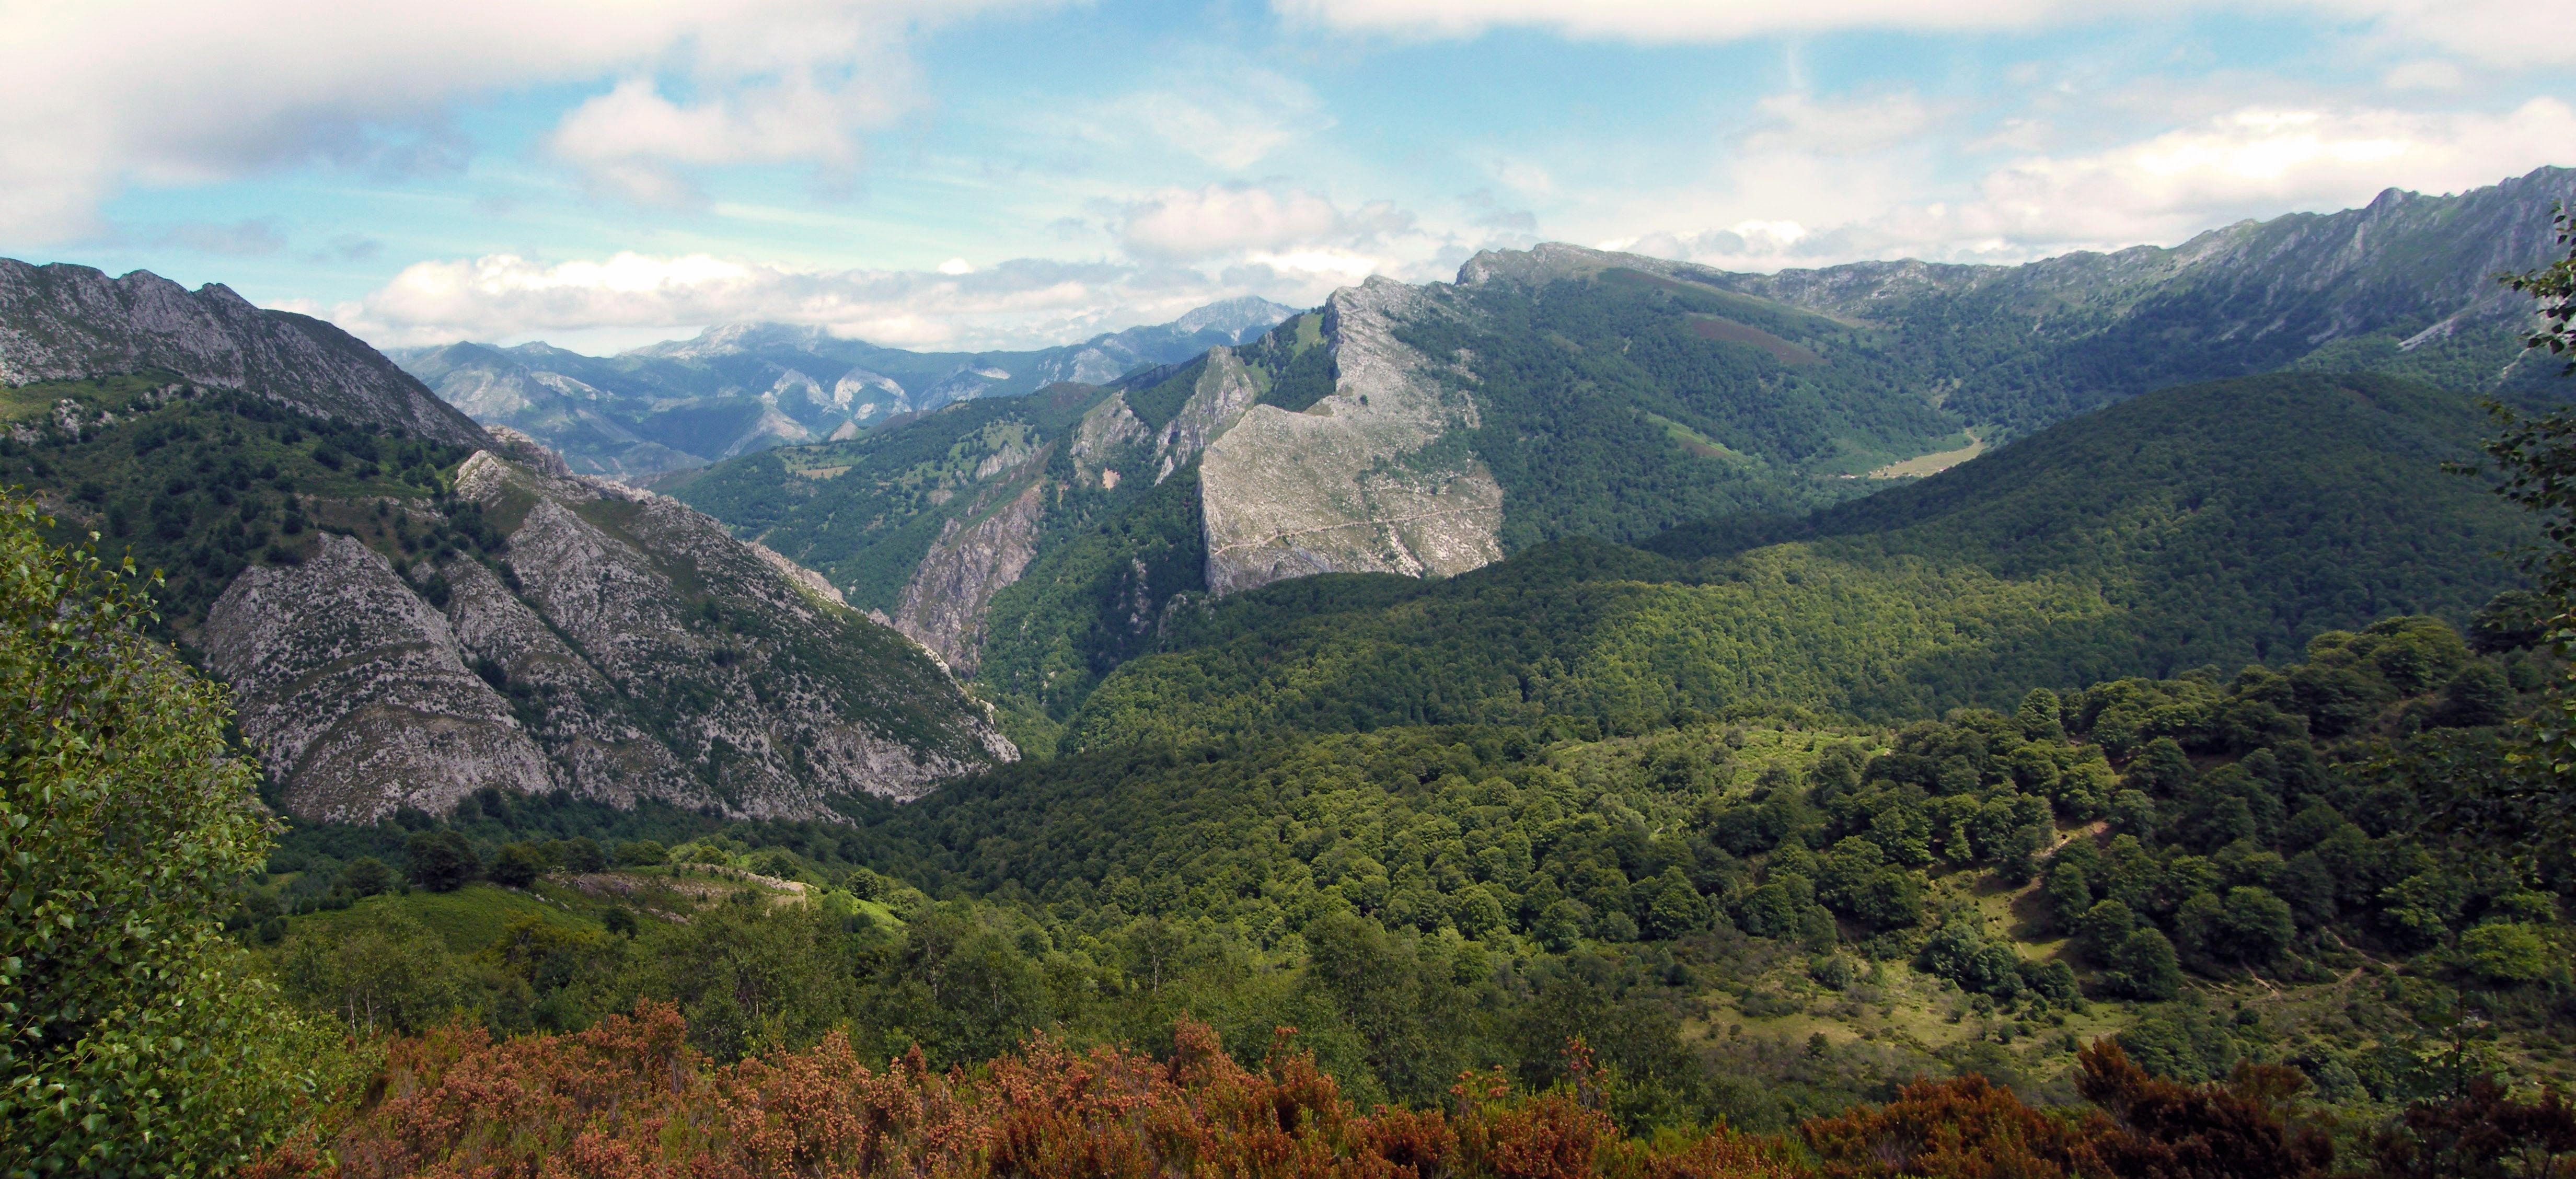 Montañas de Asturias.jpg